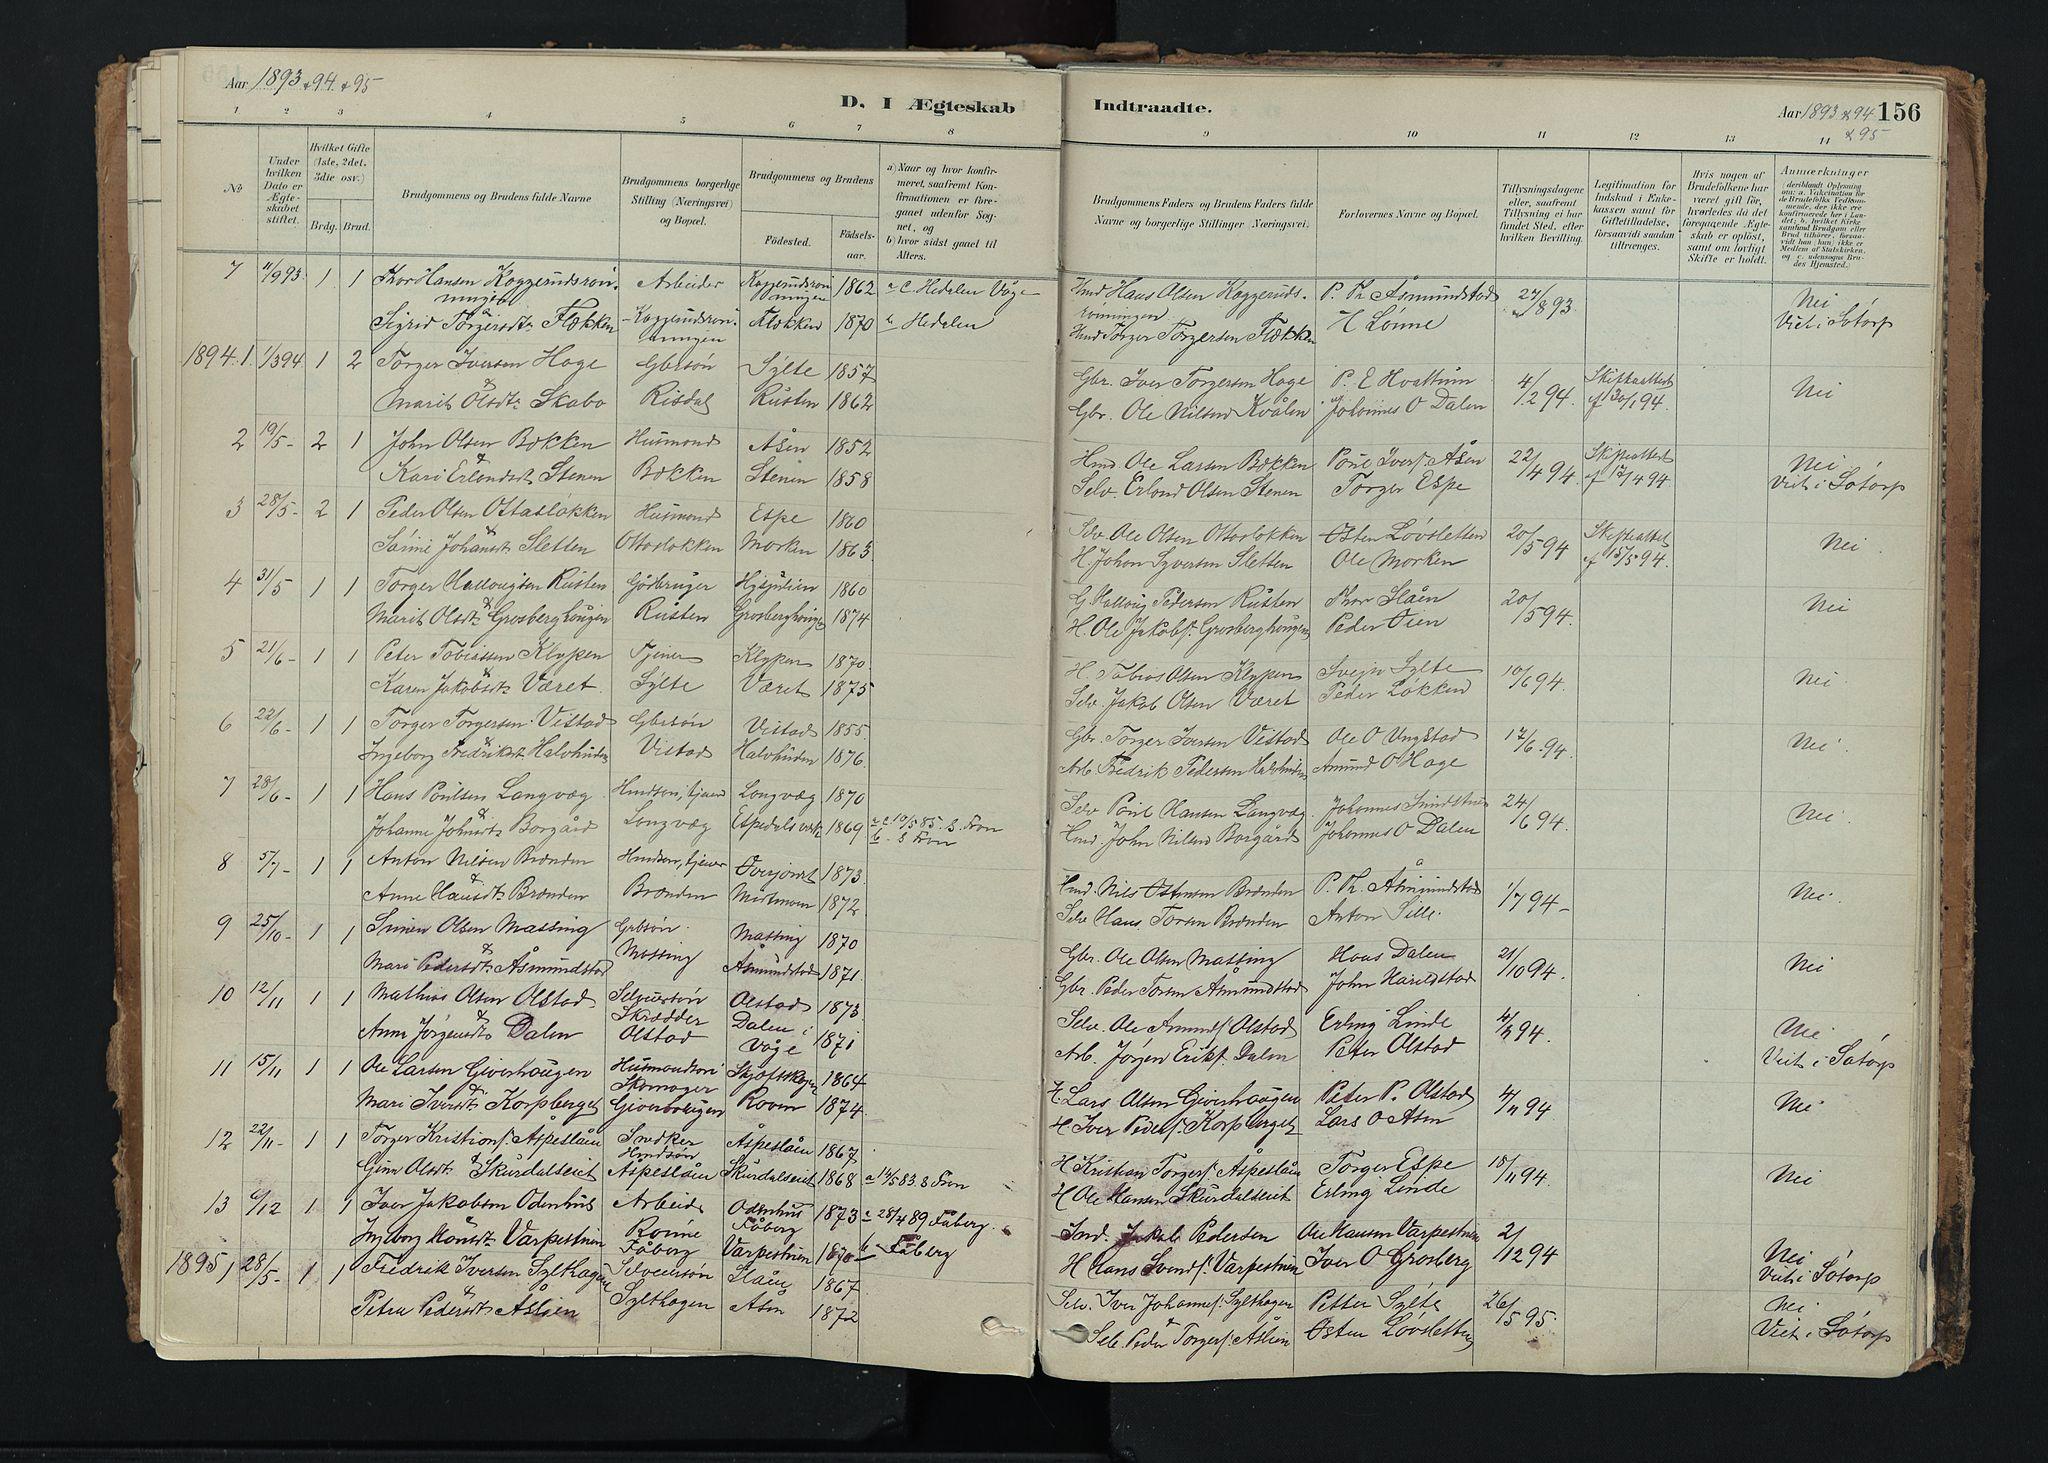 SAH, Nord-Fron prestekontor, Ministerialbok nr. 5, 1884-1914, s. 156